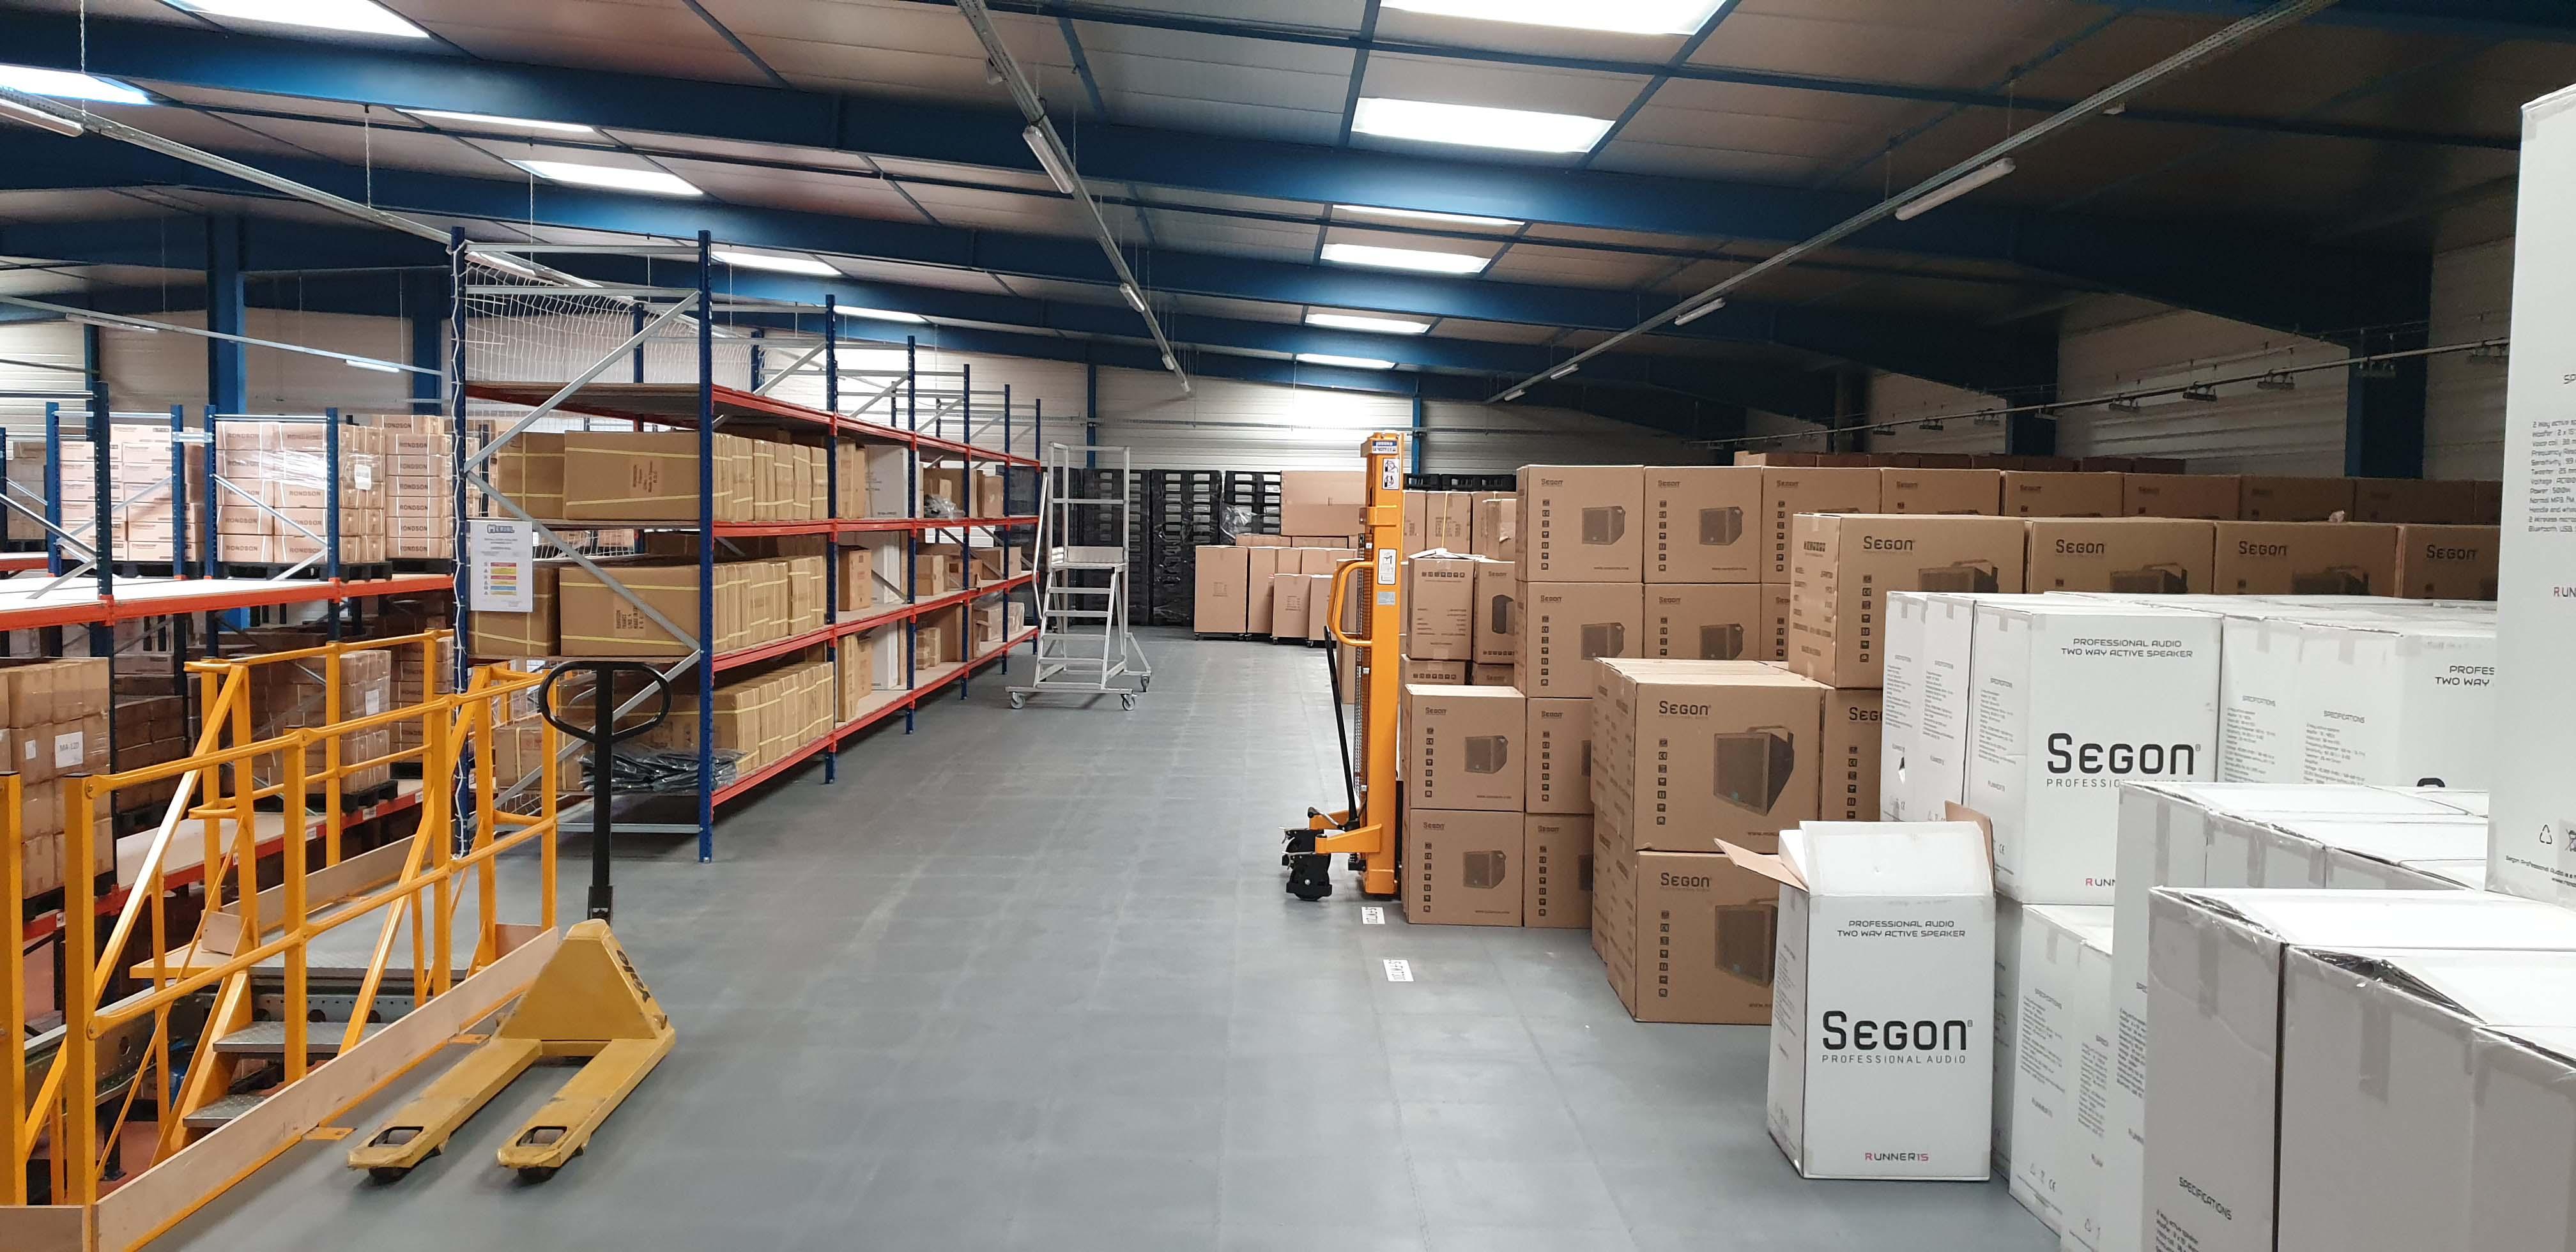 Entrepôt stock rondson étage